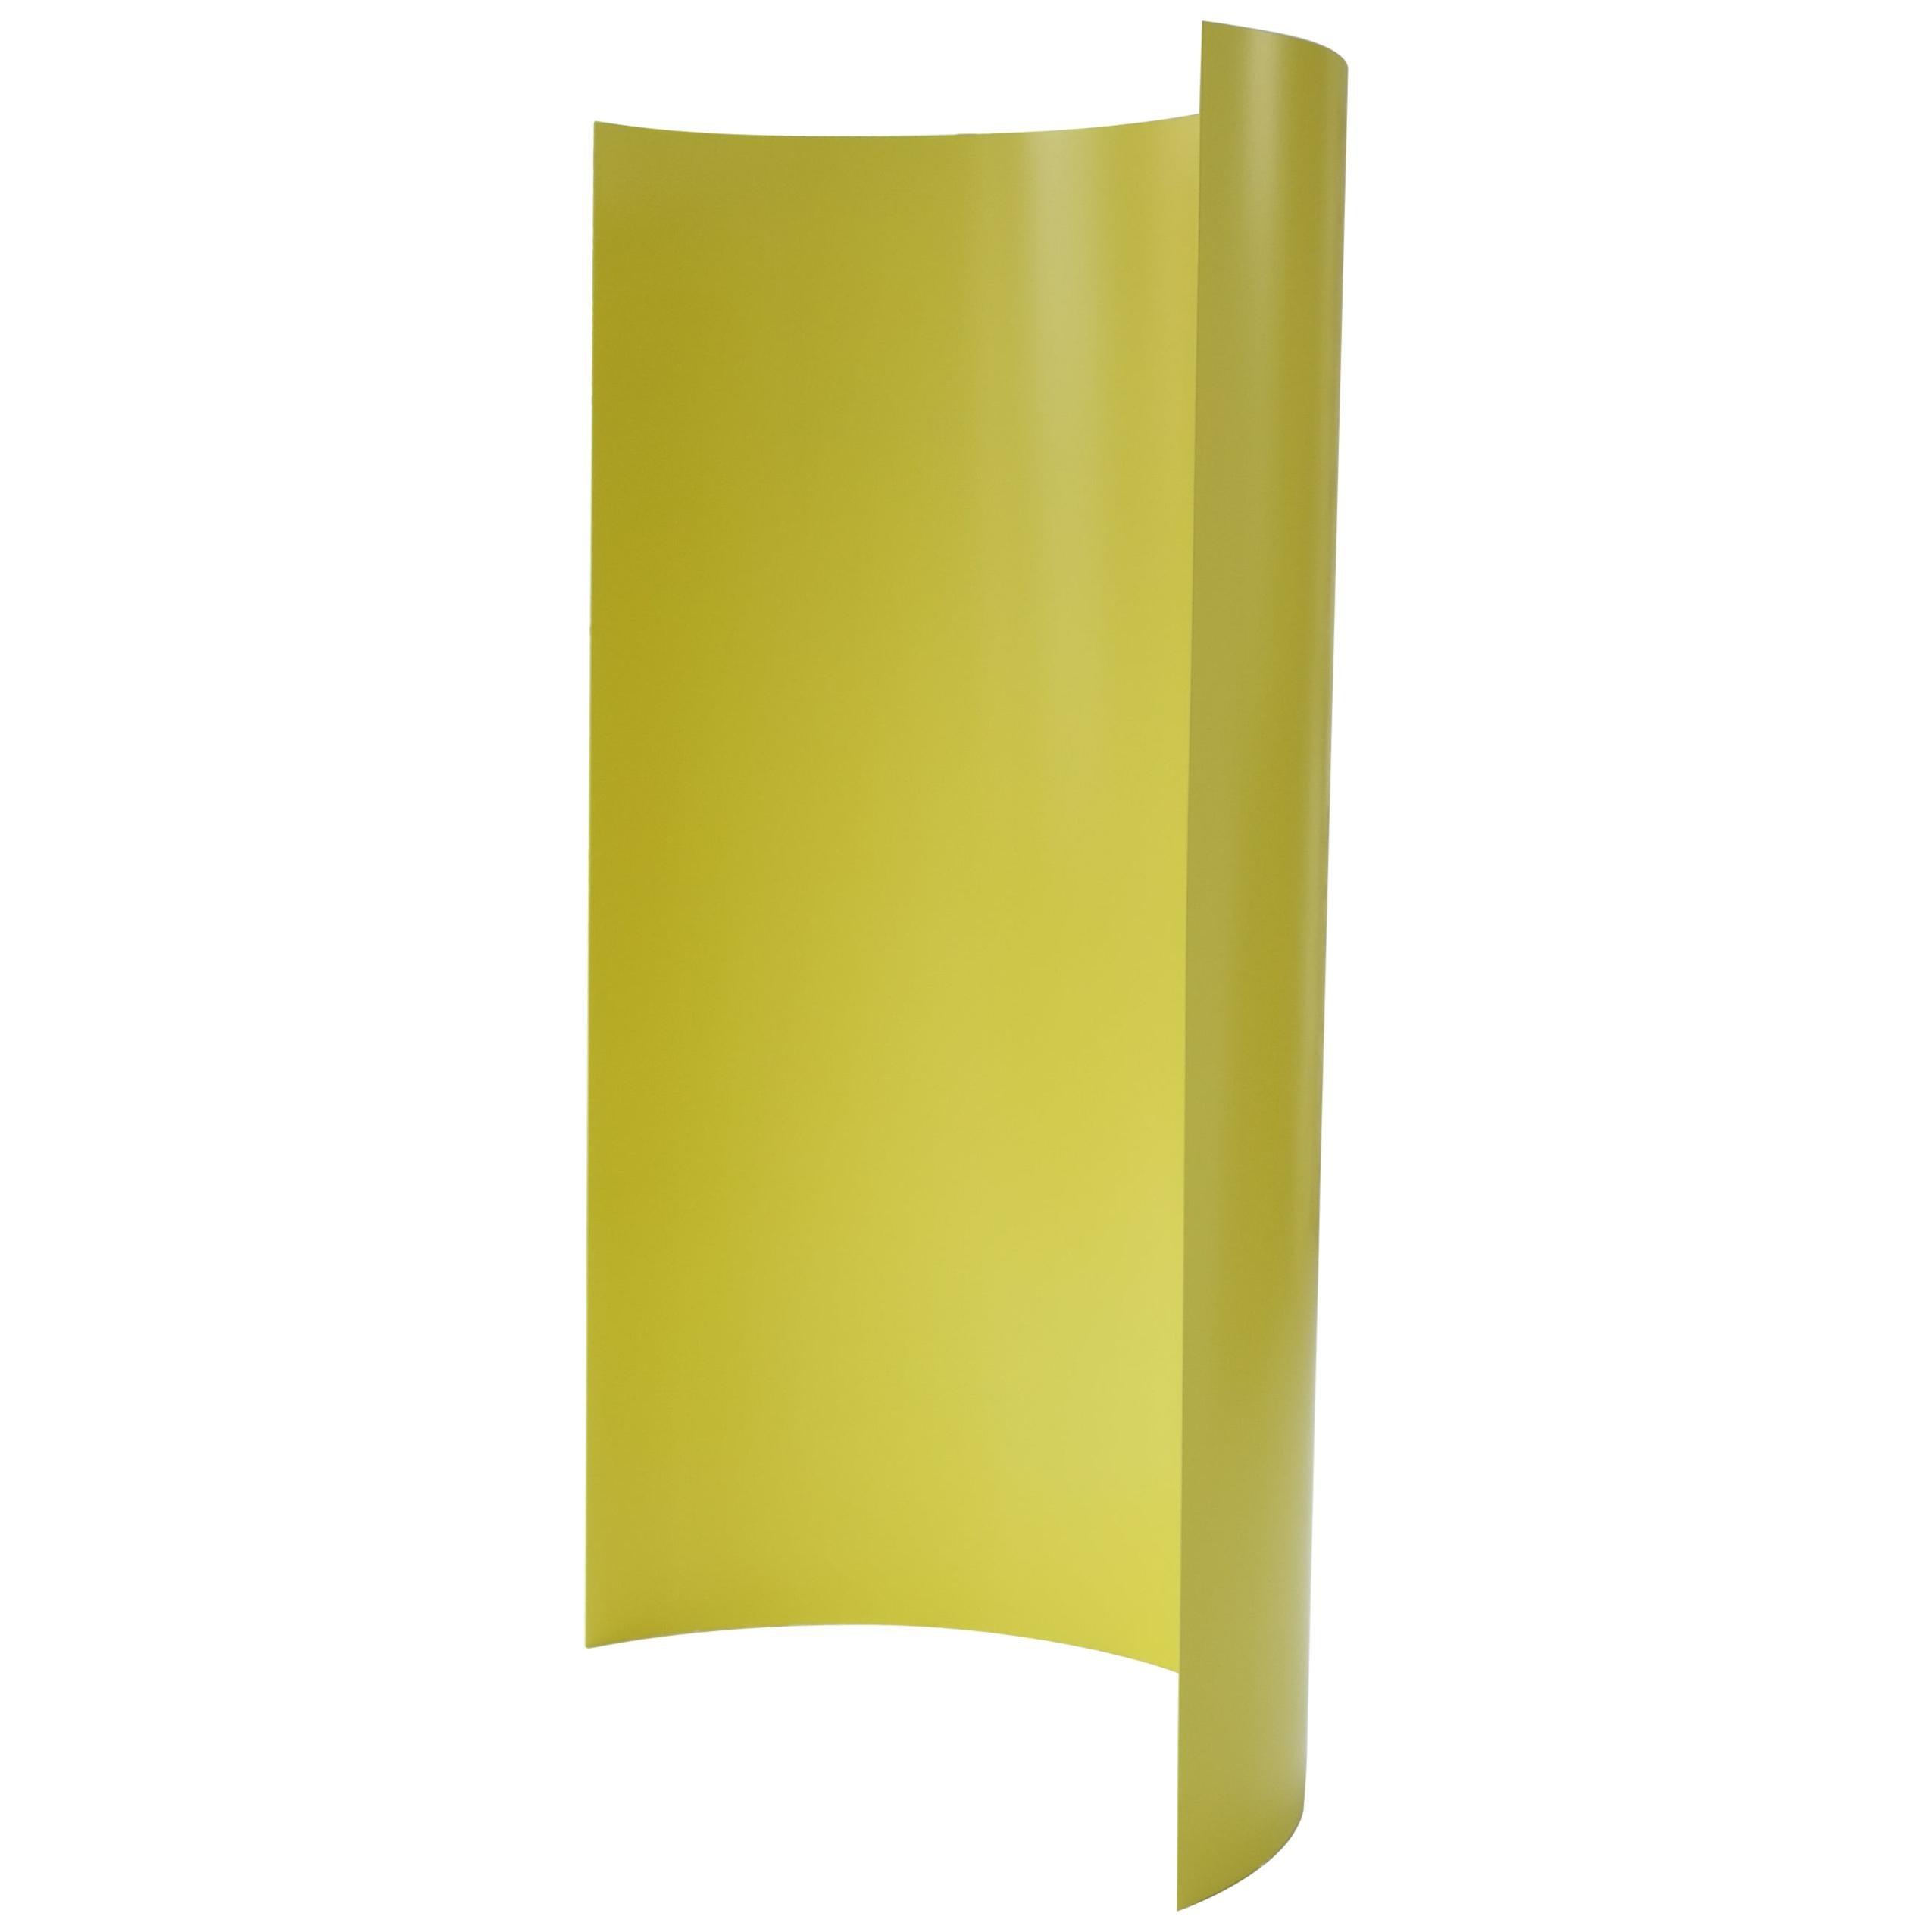 Gray Screen, Yellow, Curved Aluminium Dressing Screen Room Divider